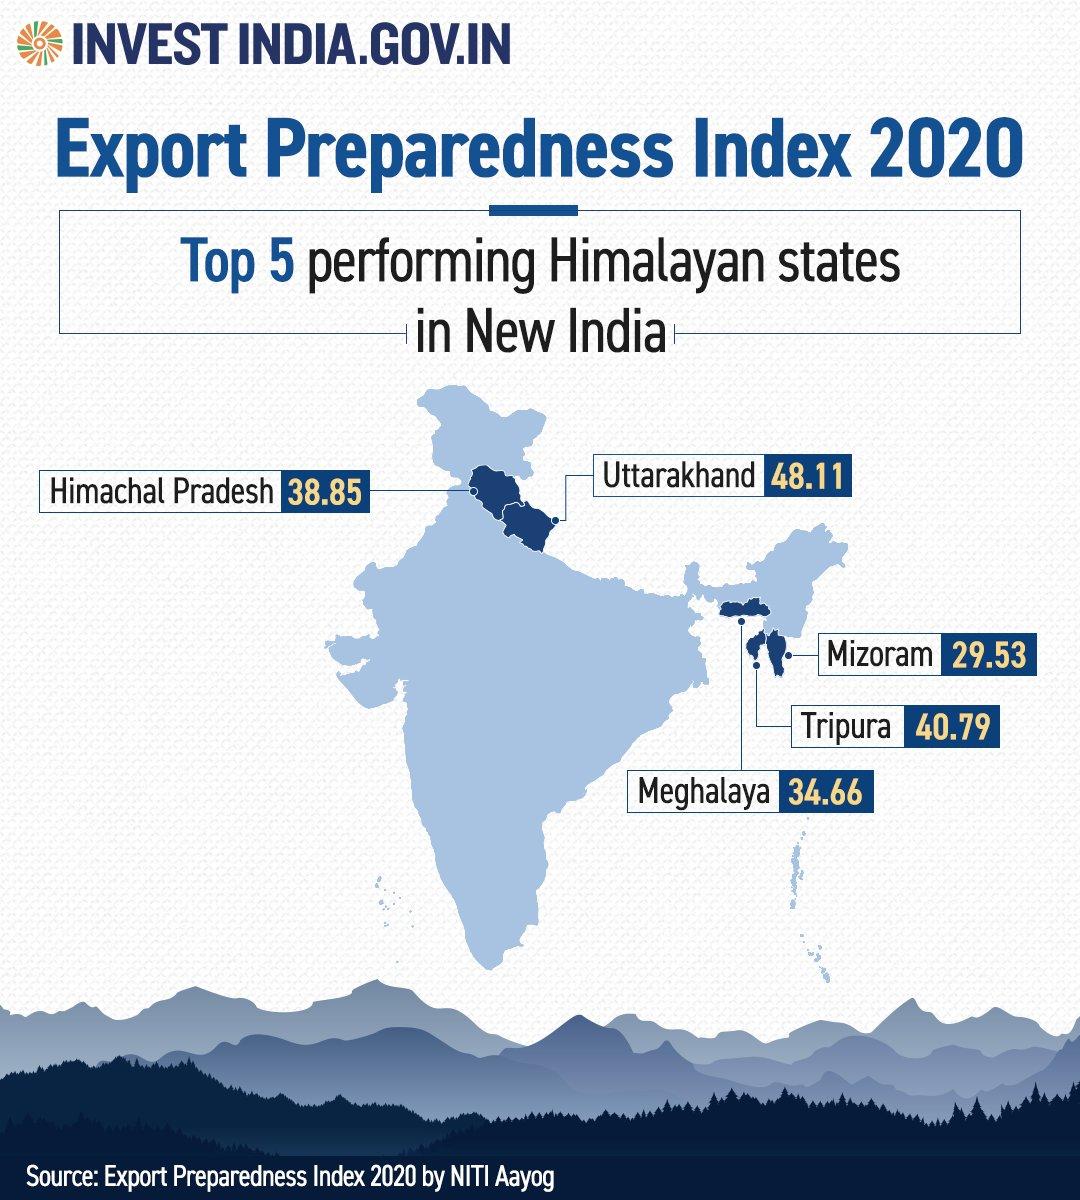 #InvestinIndia  Proactive policies & fiscal incentives - transforming Himalayan states into manufacturing powerhouses!  Read more:   #MakeinIndia #NewIndia @makeinindia